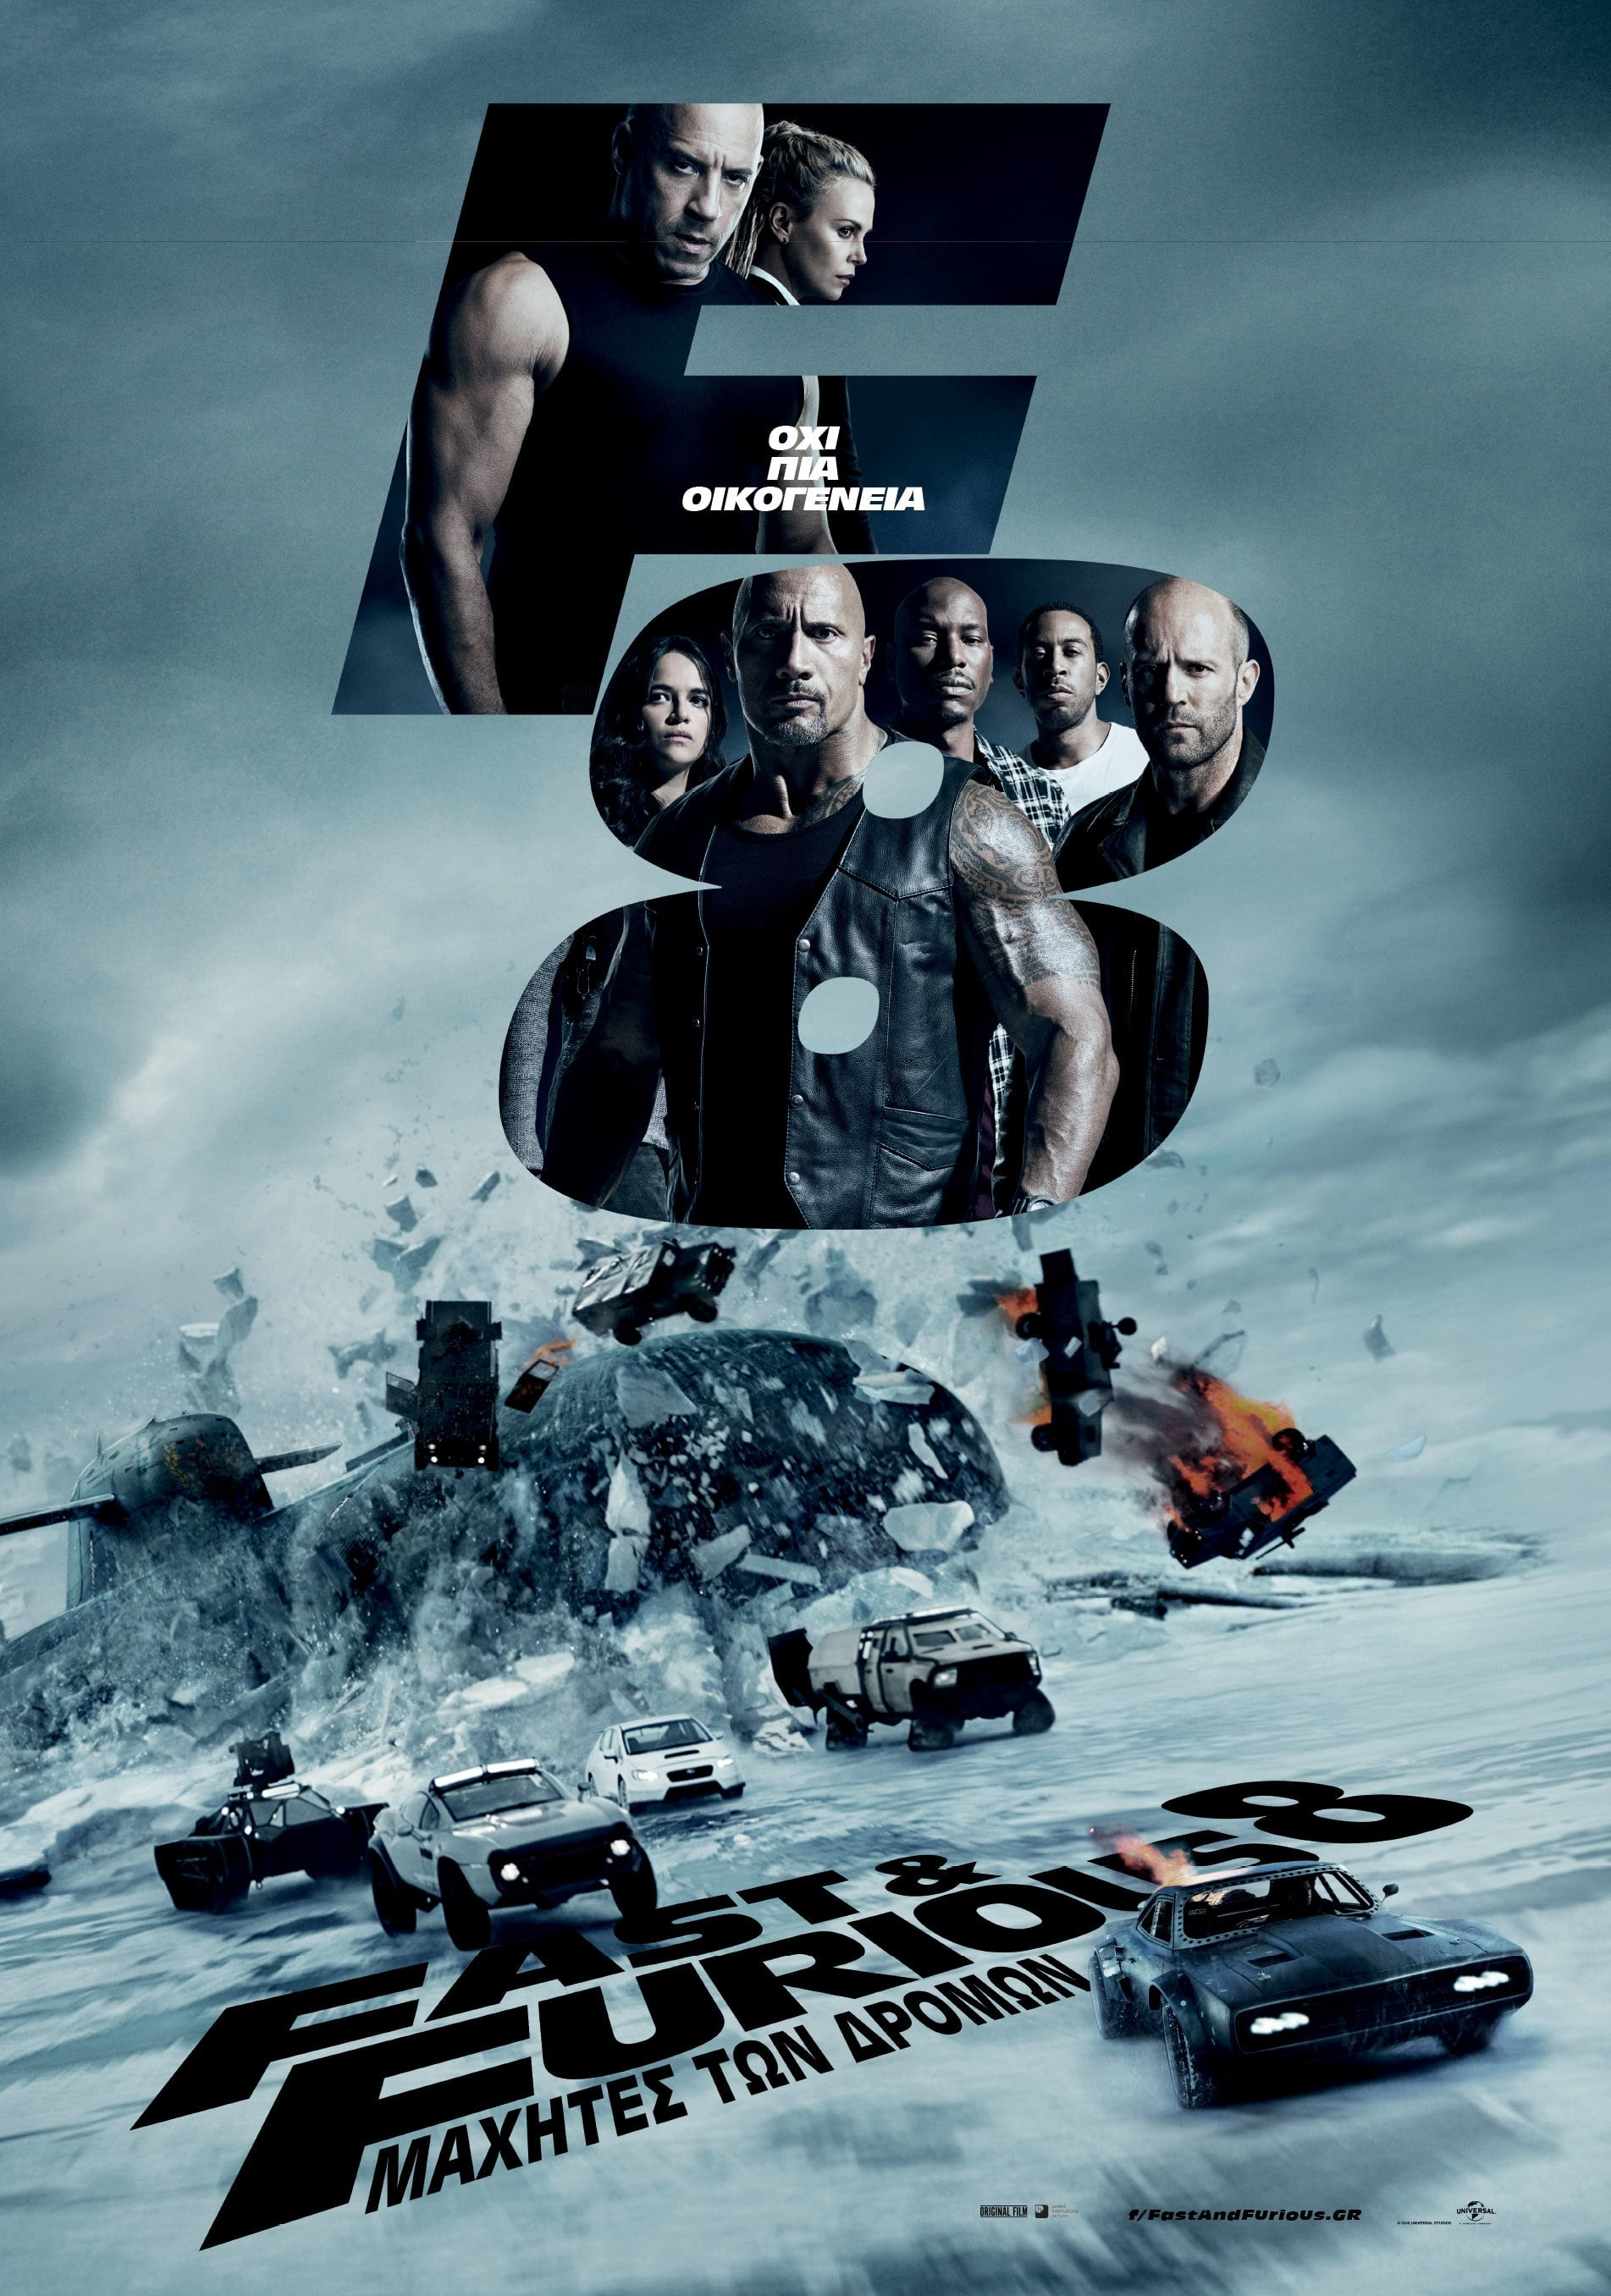 Poster and image movie Film Furios si Iute 8 - Furios și iute 8 - The Fate of the Furious - The Fate of the Furious -  2017